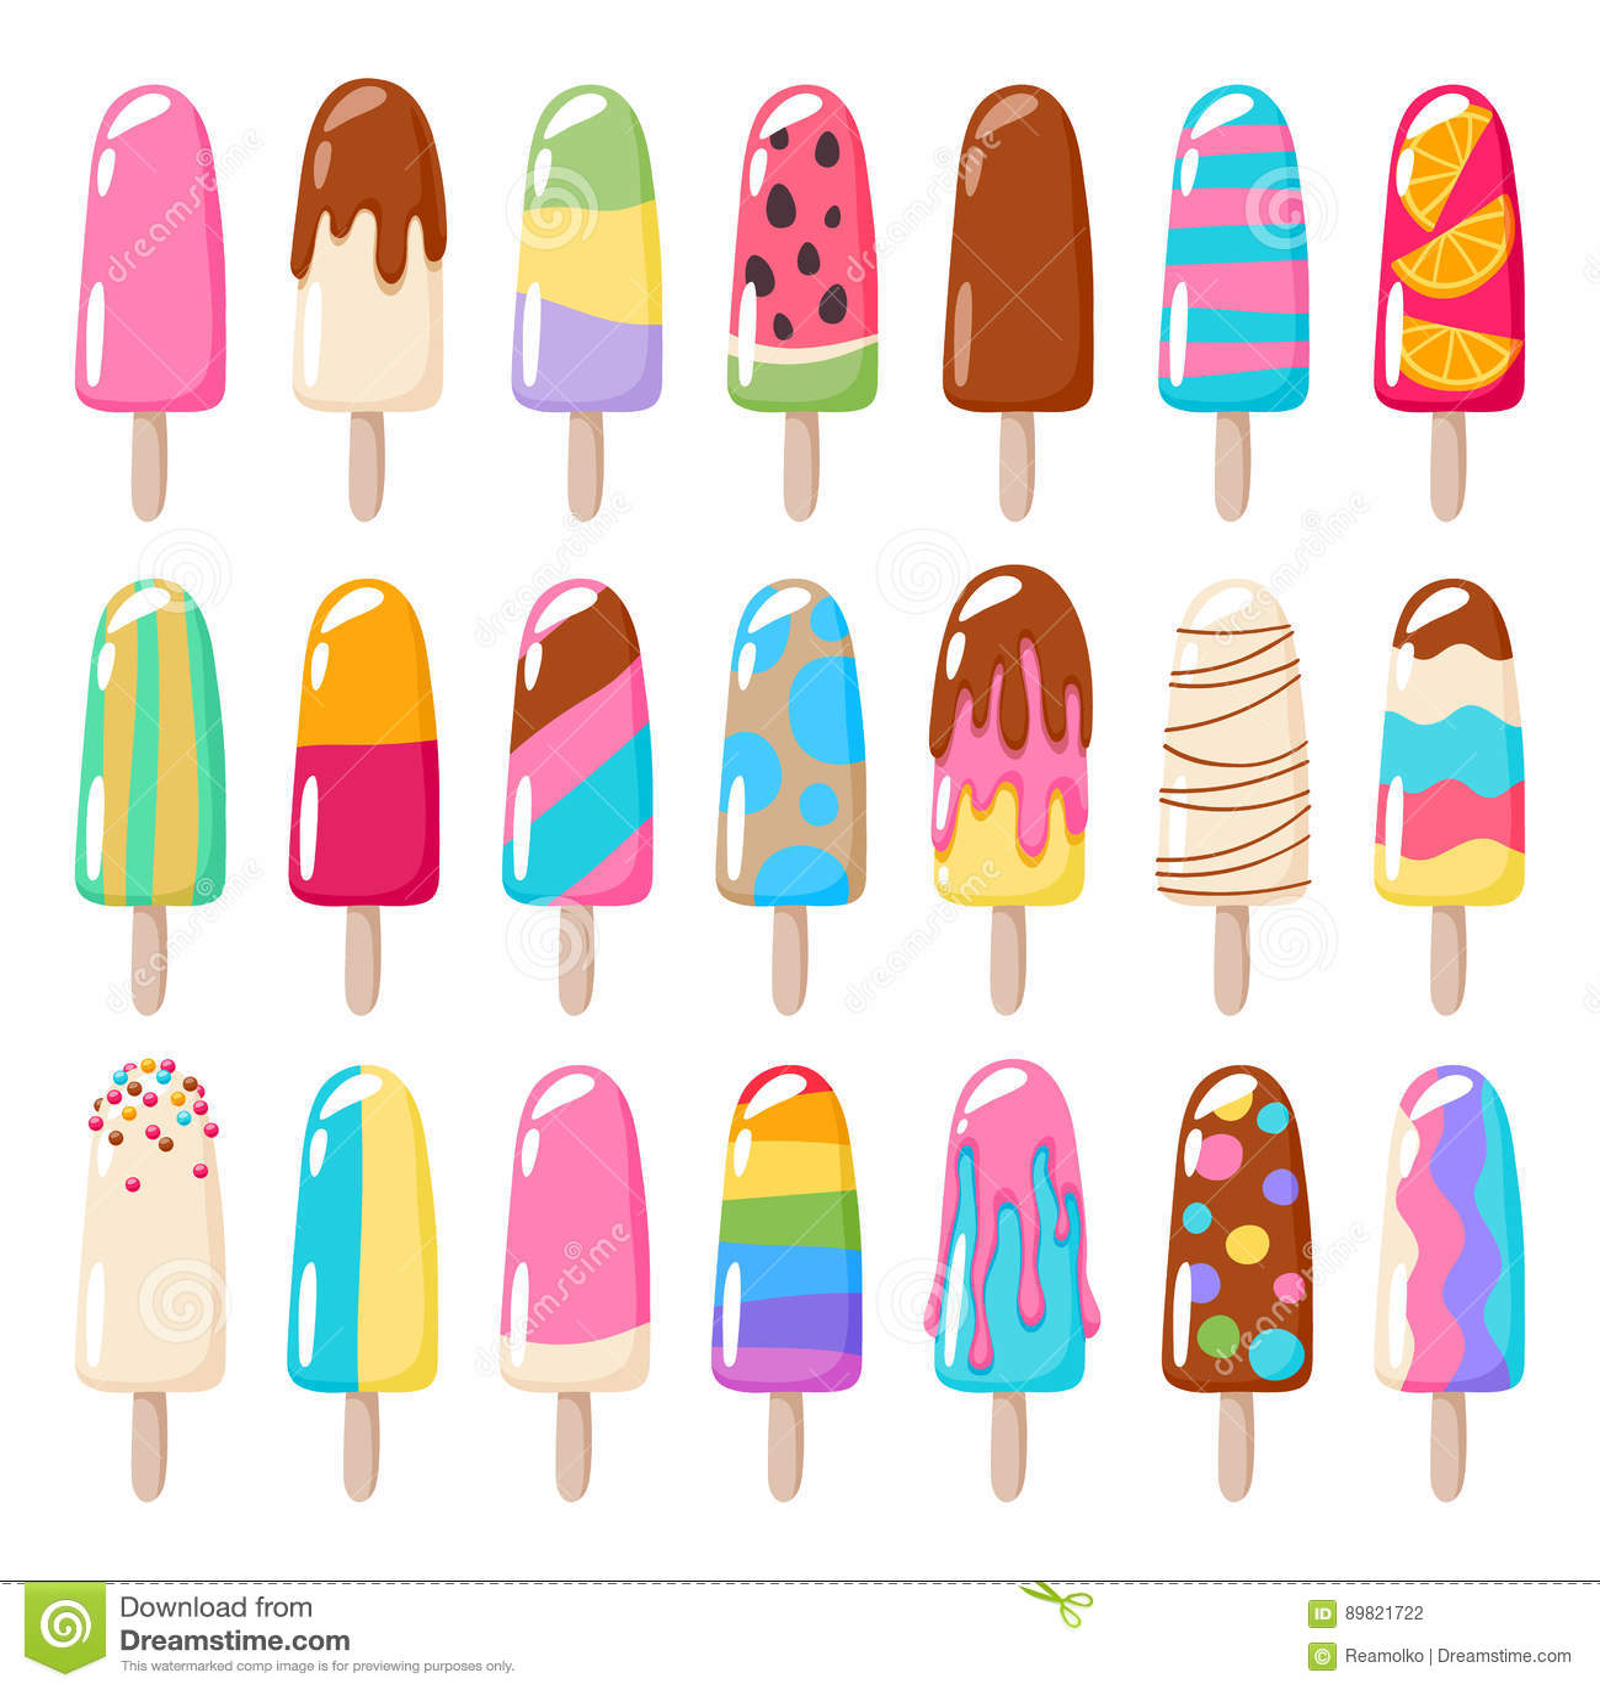 Popsicle Stock Illustrations – 6,861 Popsicle Stock ...